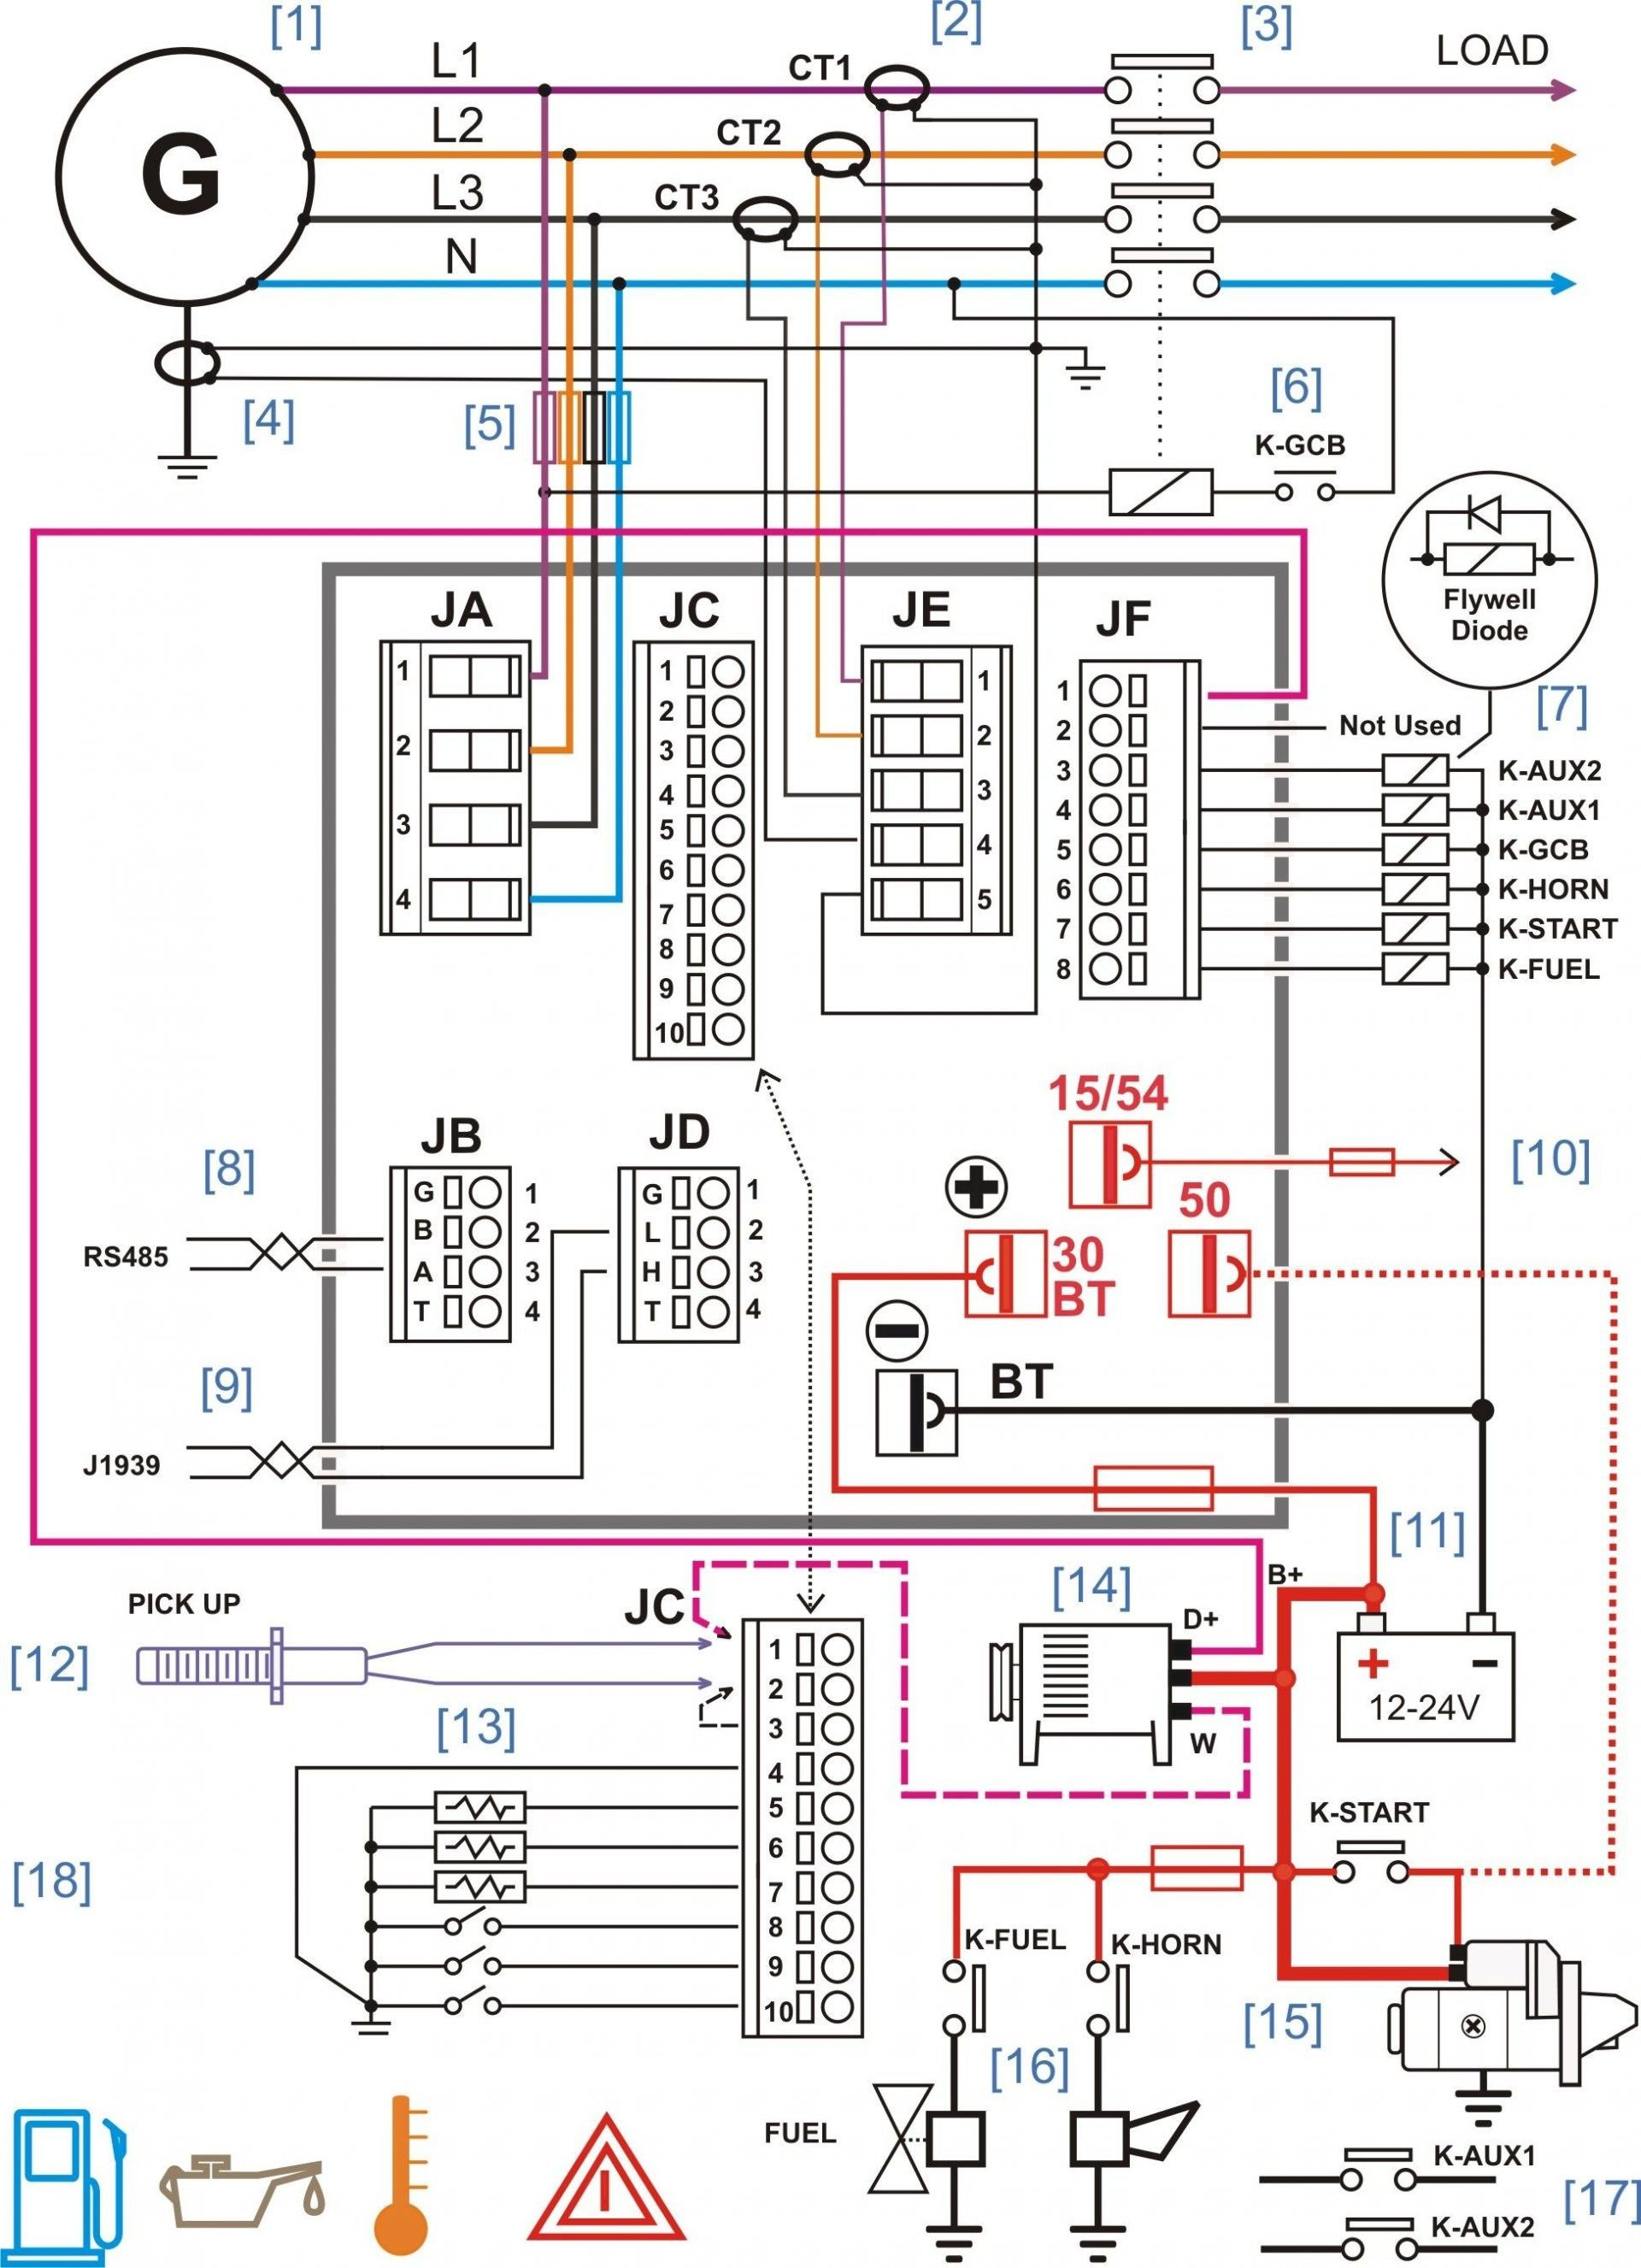 New Car Wiring Diagram Explained Diagrama de circuito